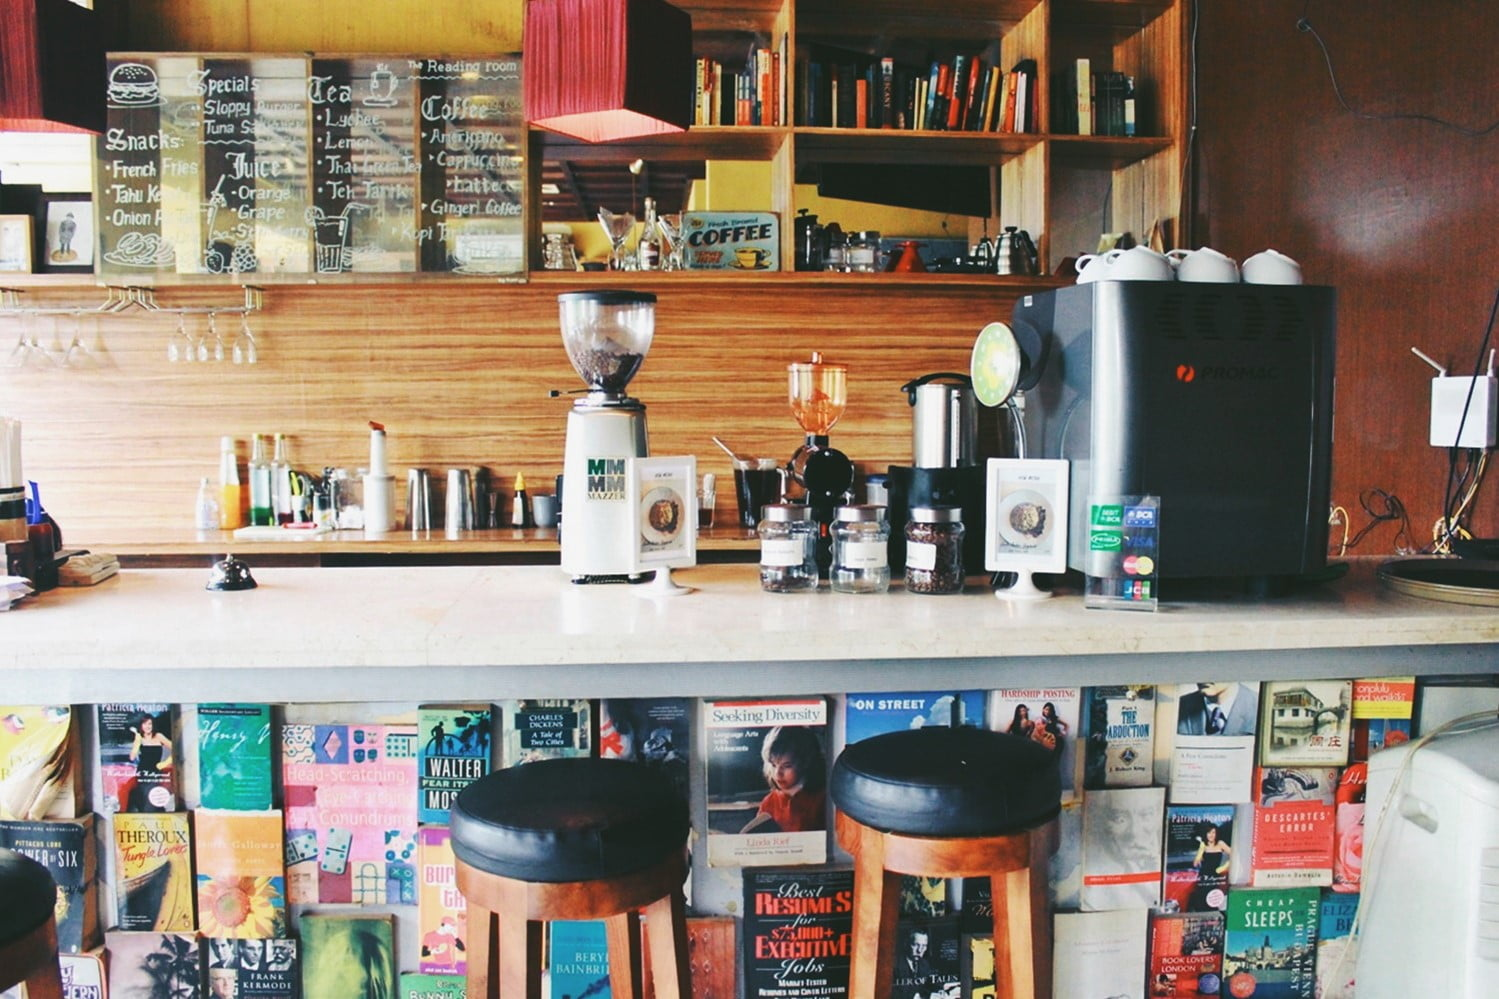 Nagra dan Aru, The Reading Room, Kemang Sensasi Makan di Perpustakaan